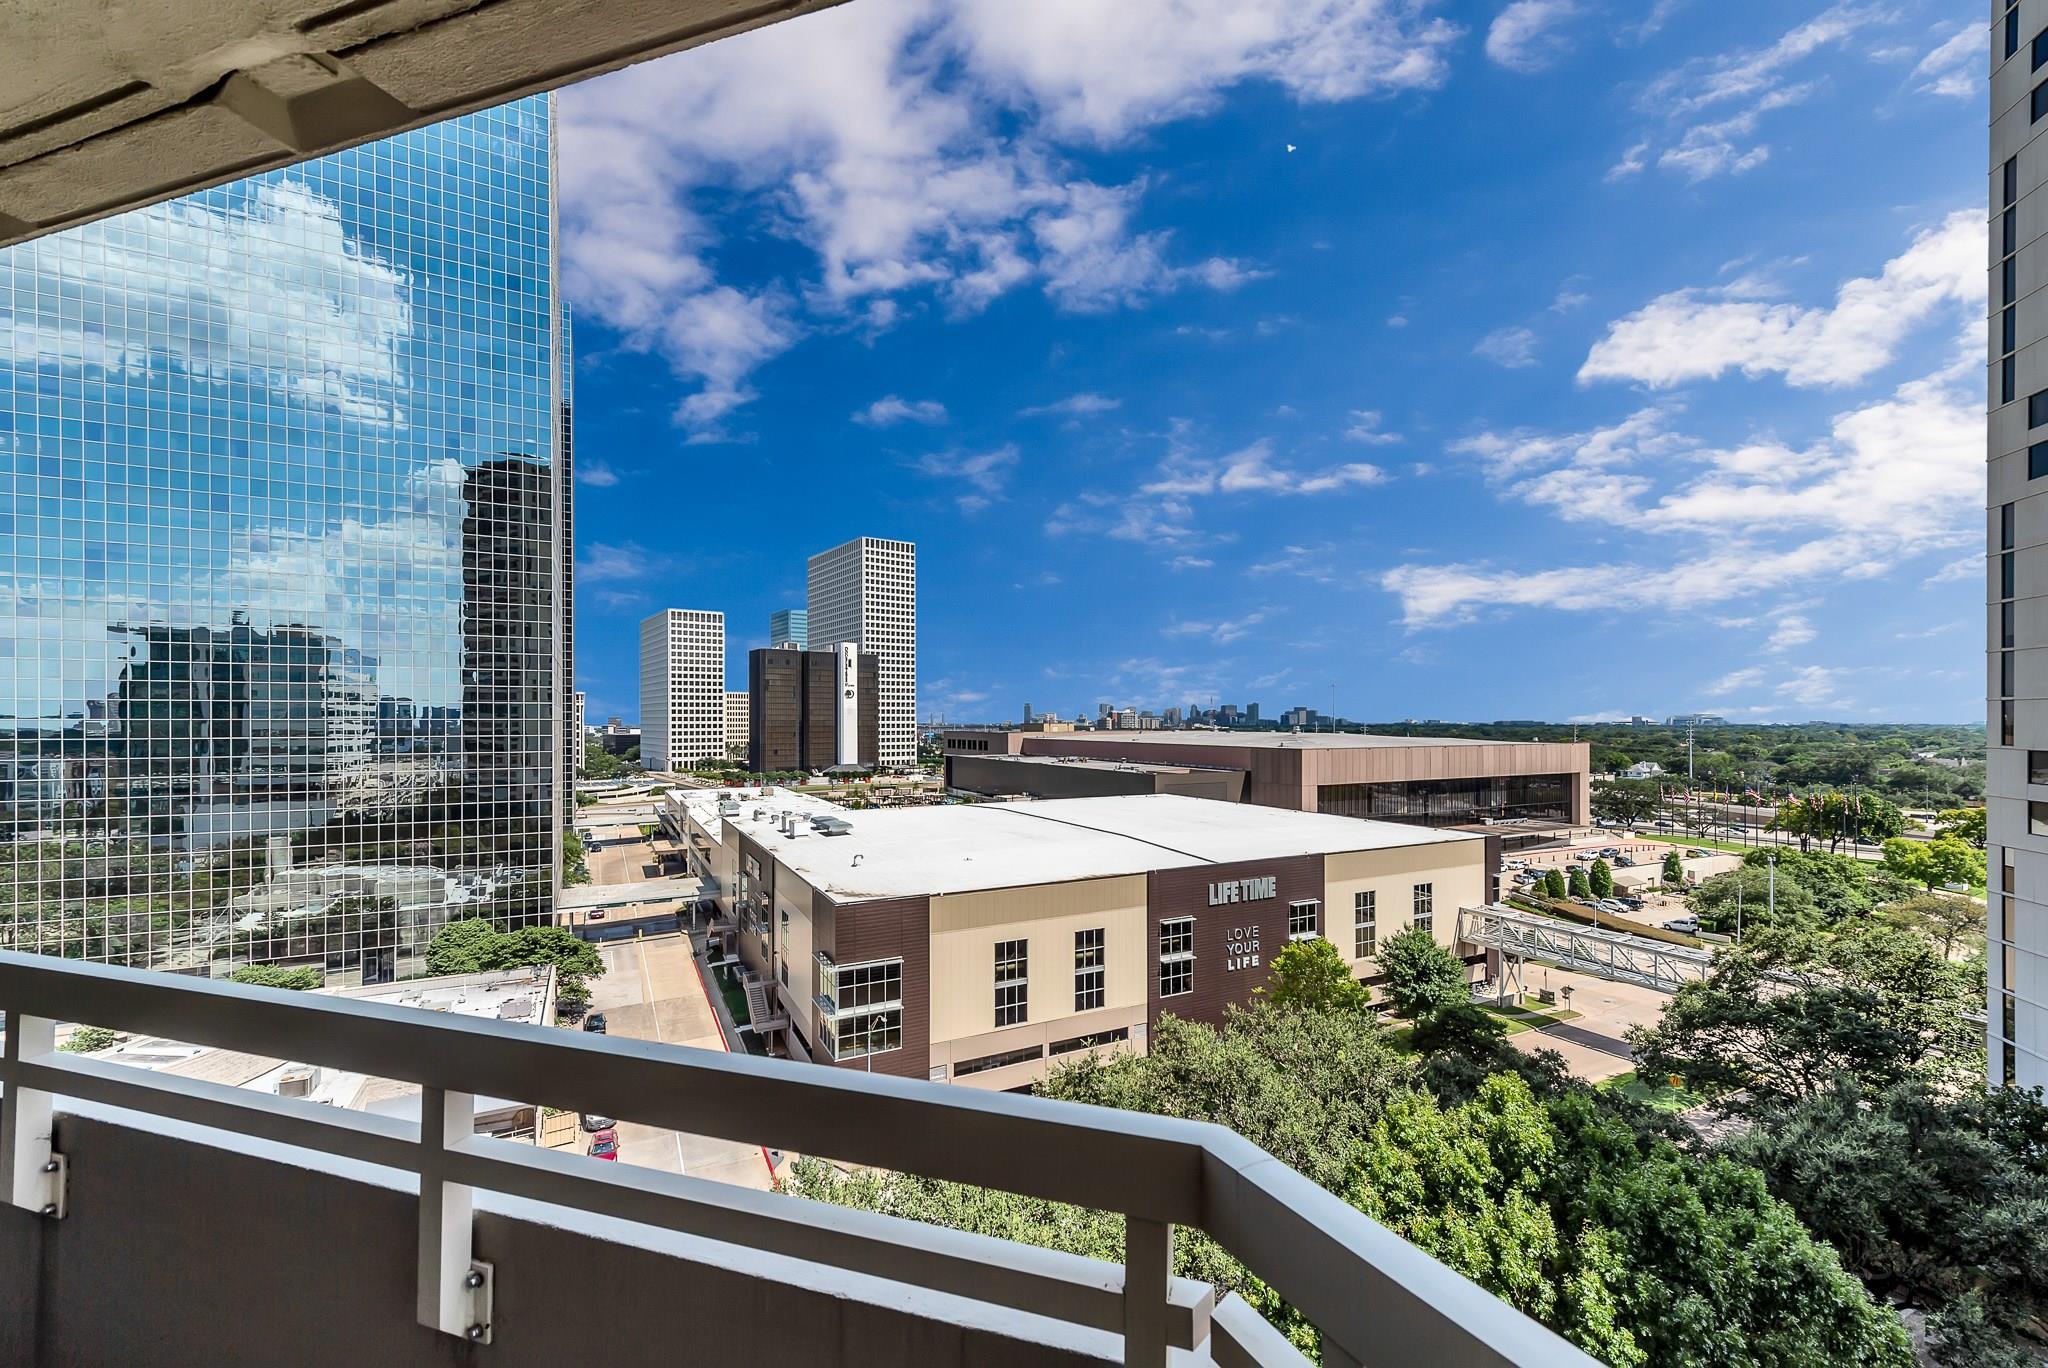 14 Greenway Plaza #11-0 Property Photo - Houston, TX real estate listing